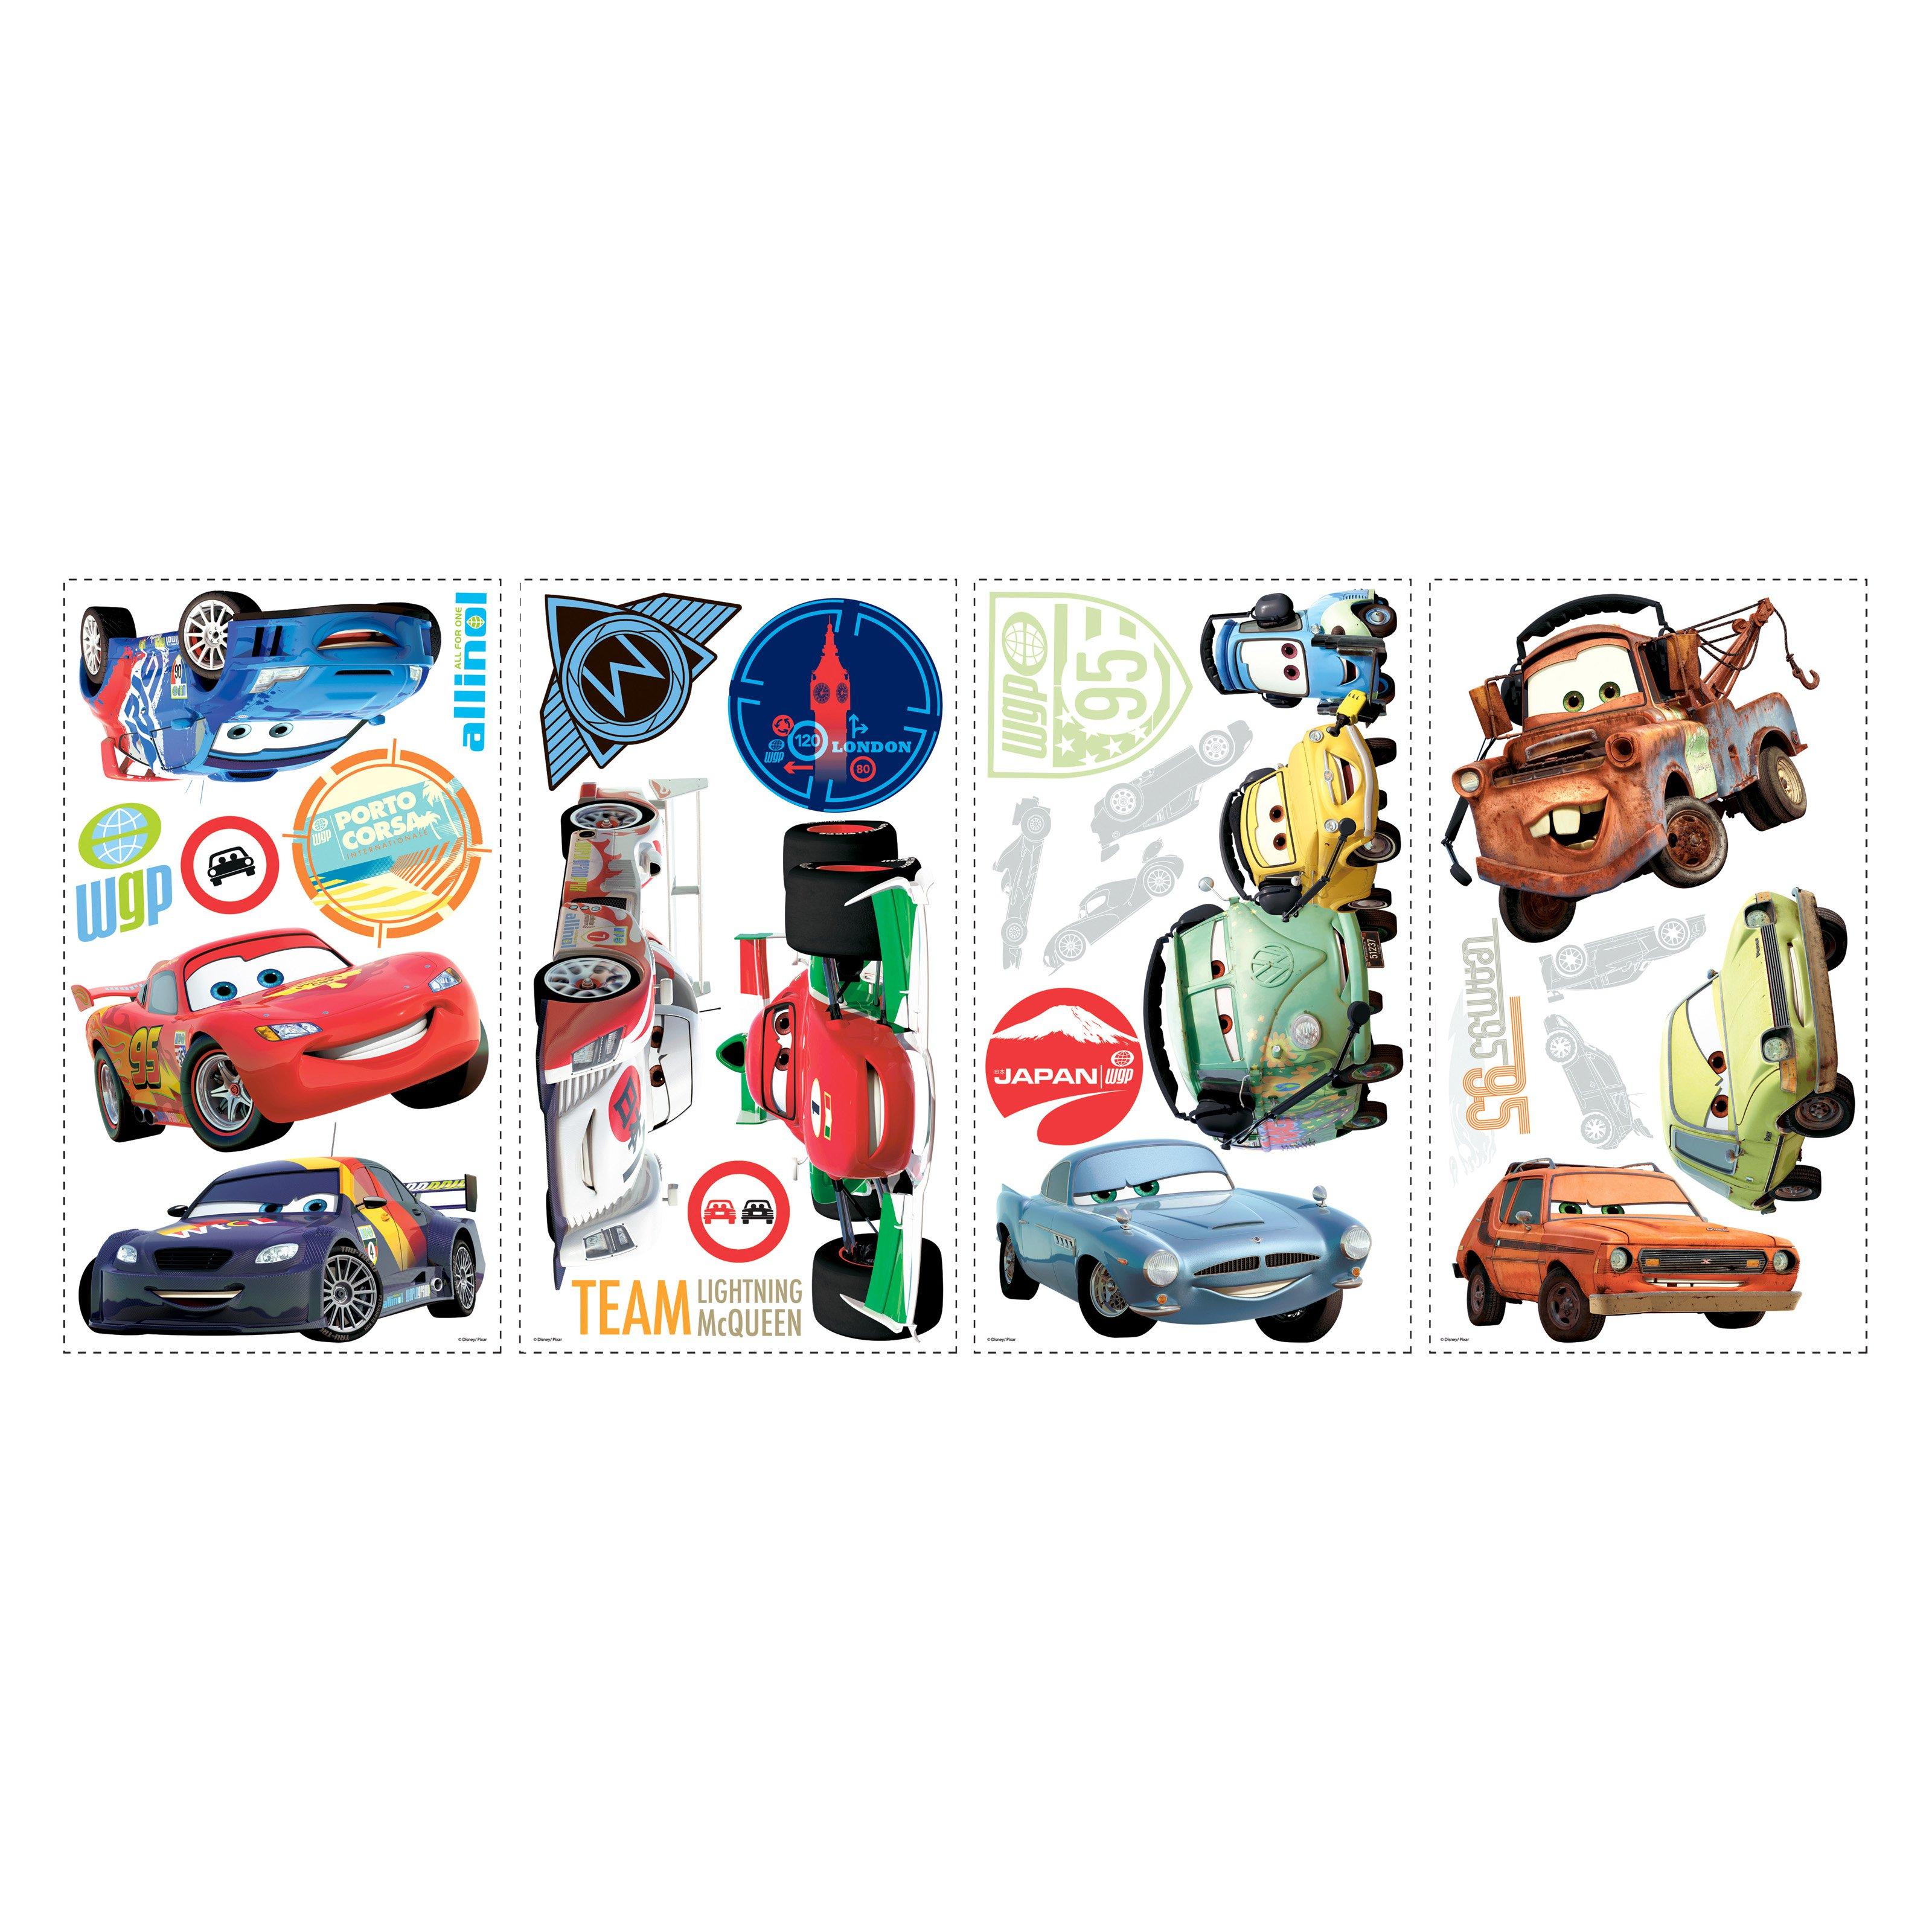 Disney Championship Cars Wallpaper Border Self Adhesive Children Bedroom 19